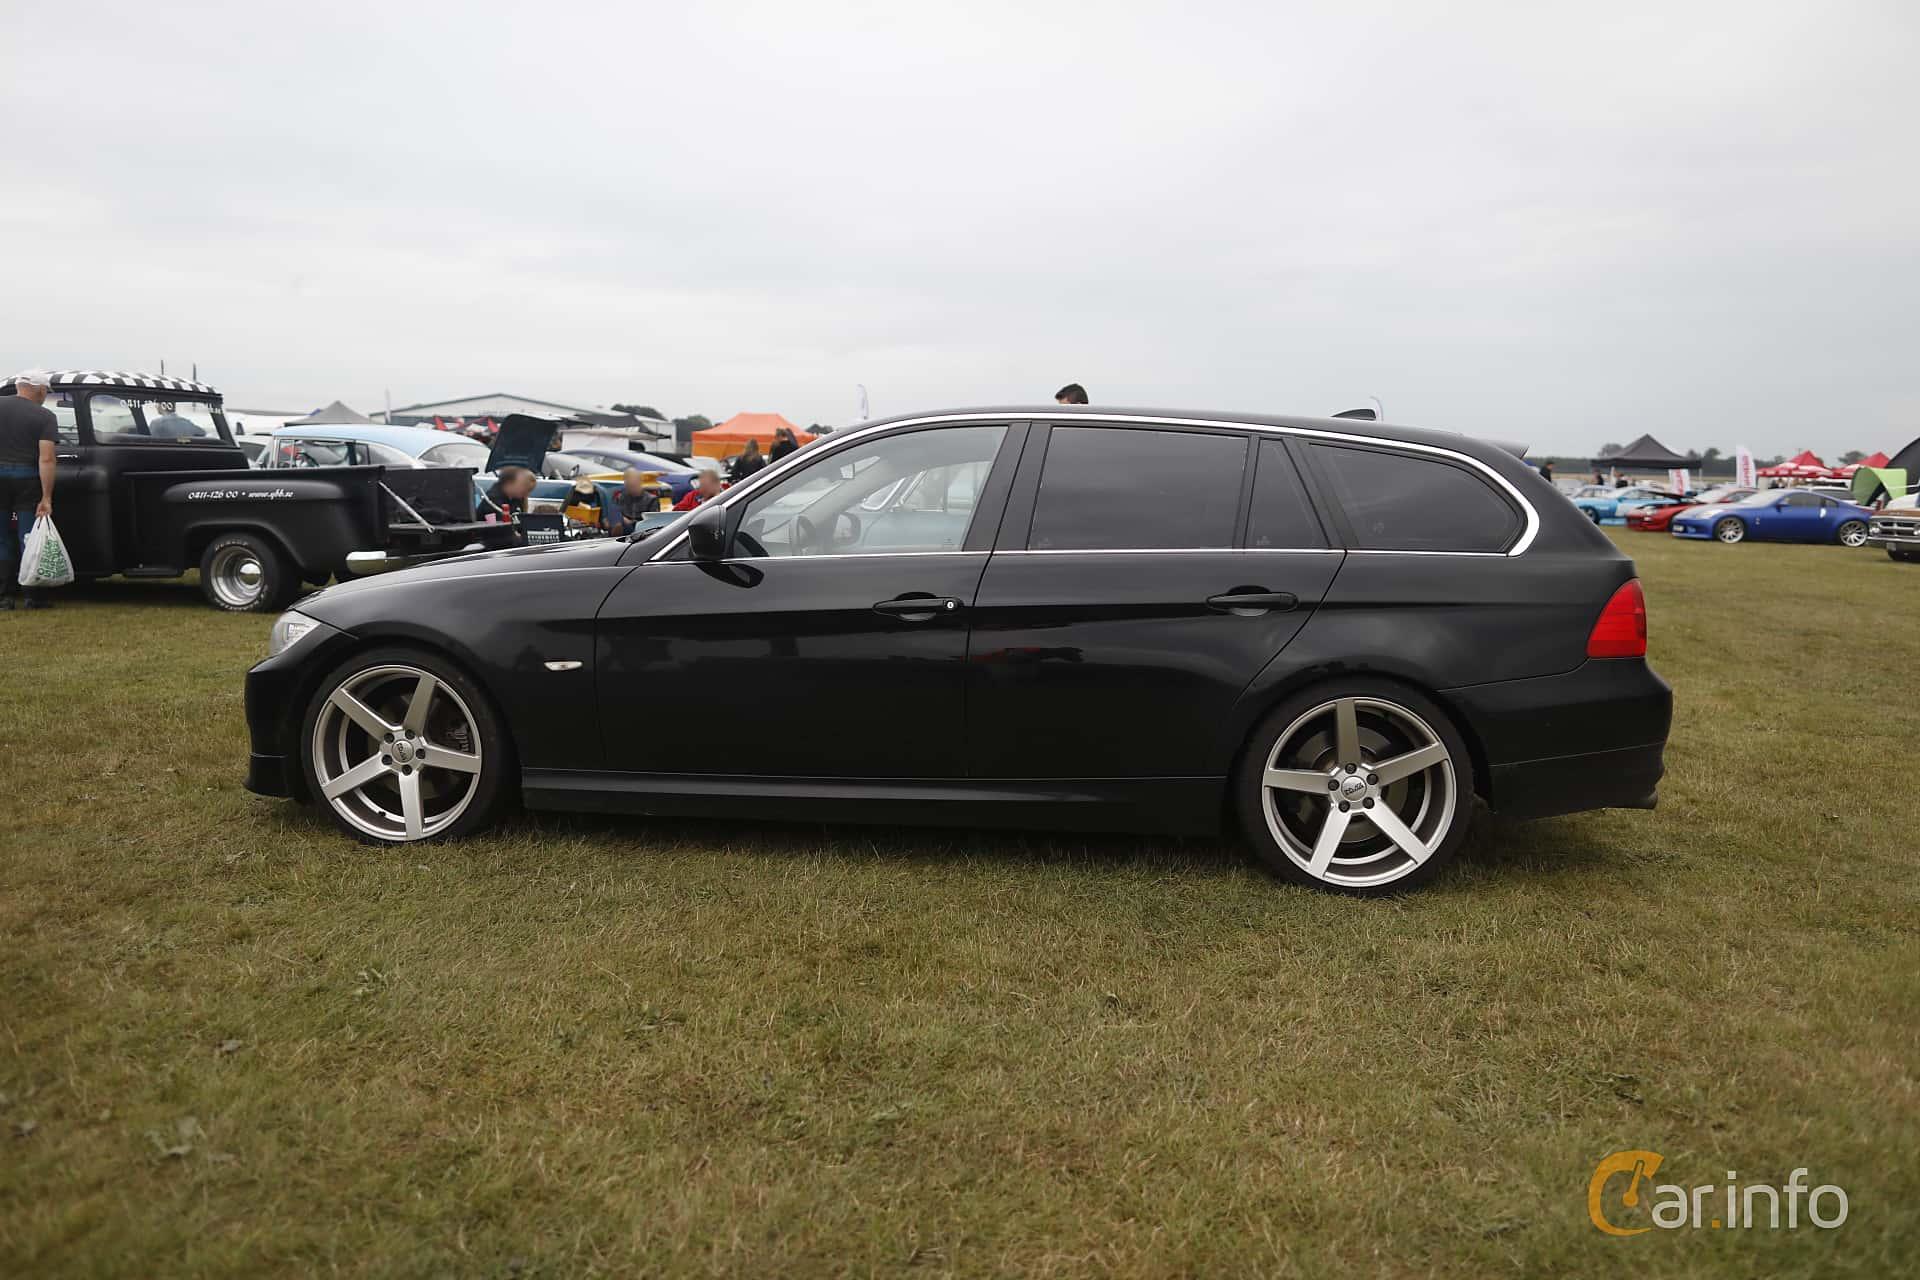 BMW 325d generation E90 LCI, Automatic, 6-speed